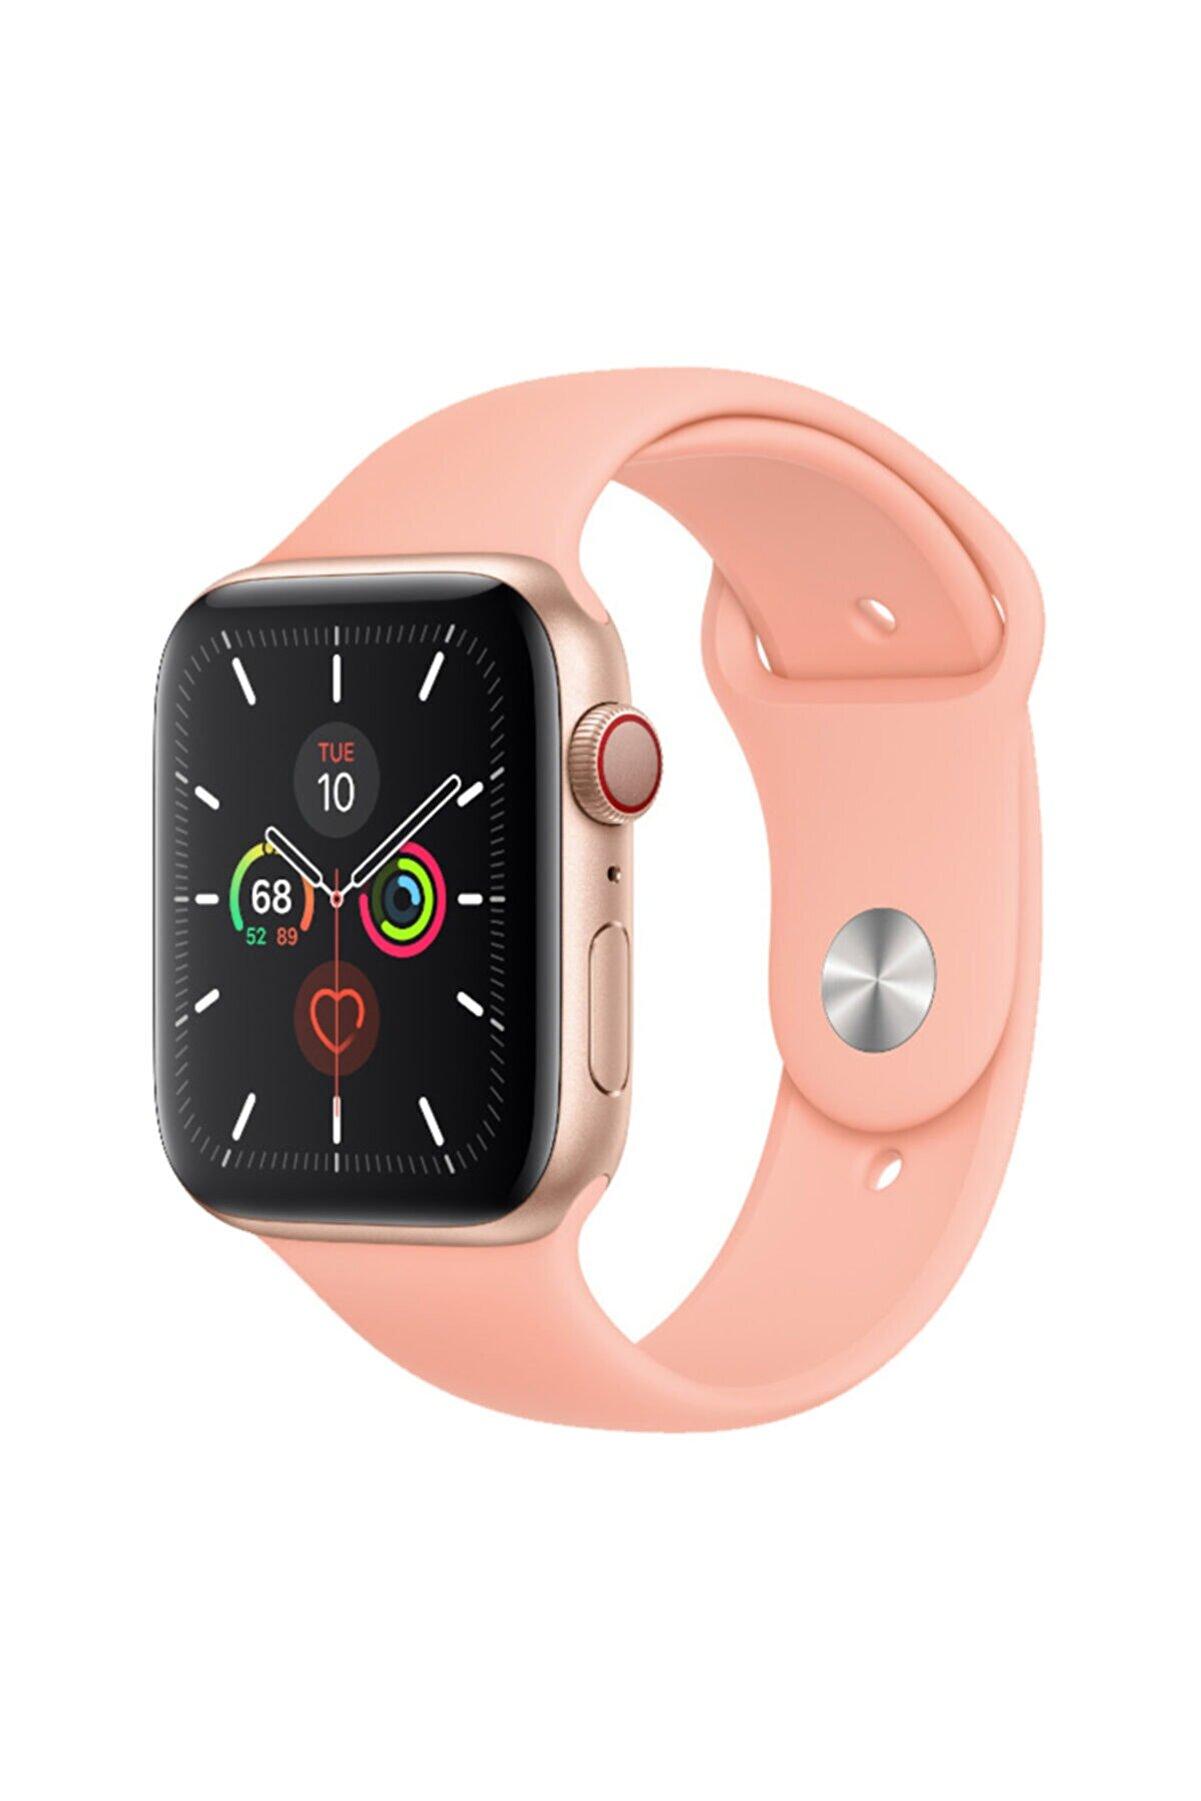 Cimricik Apple Watch Kordon 2 3 4 5 6 Se Seri 38 Mm Ve 40 Mm Silikon Kordon Kayış - Pudra Pembe